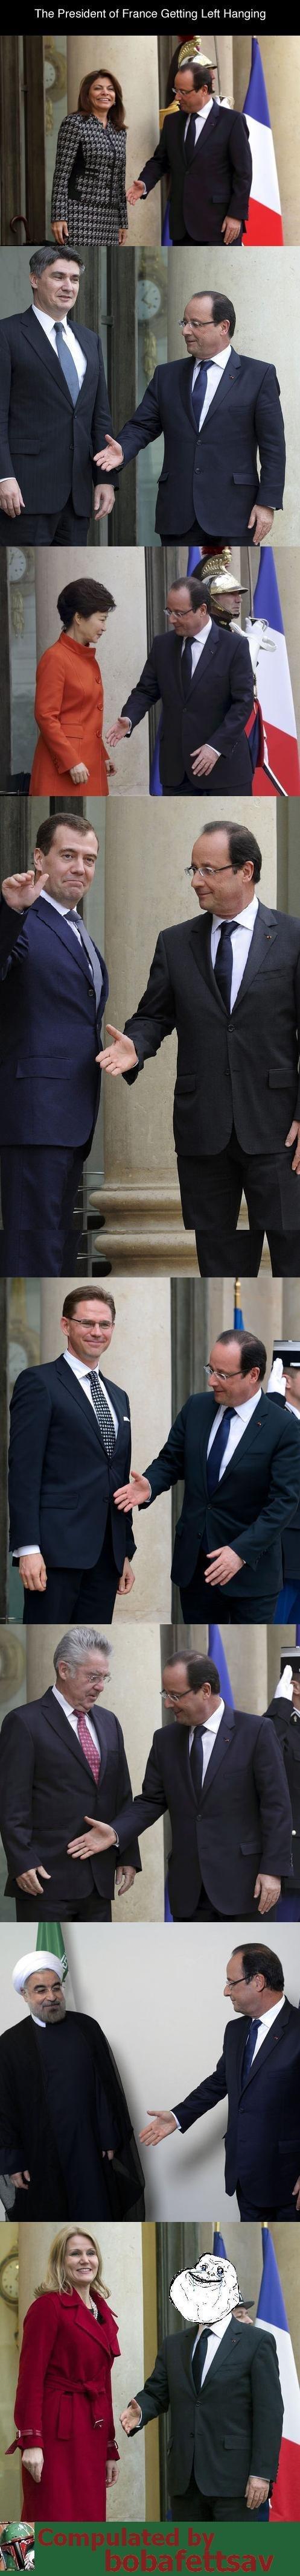 French President, François Hollande. . The President of France Getting Left Hanging